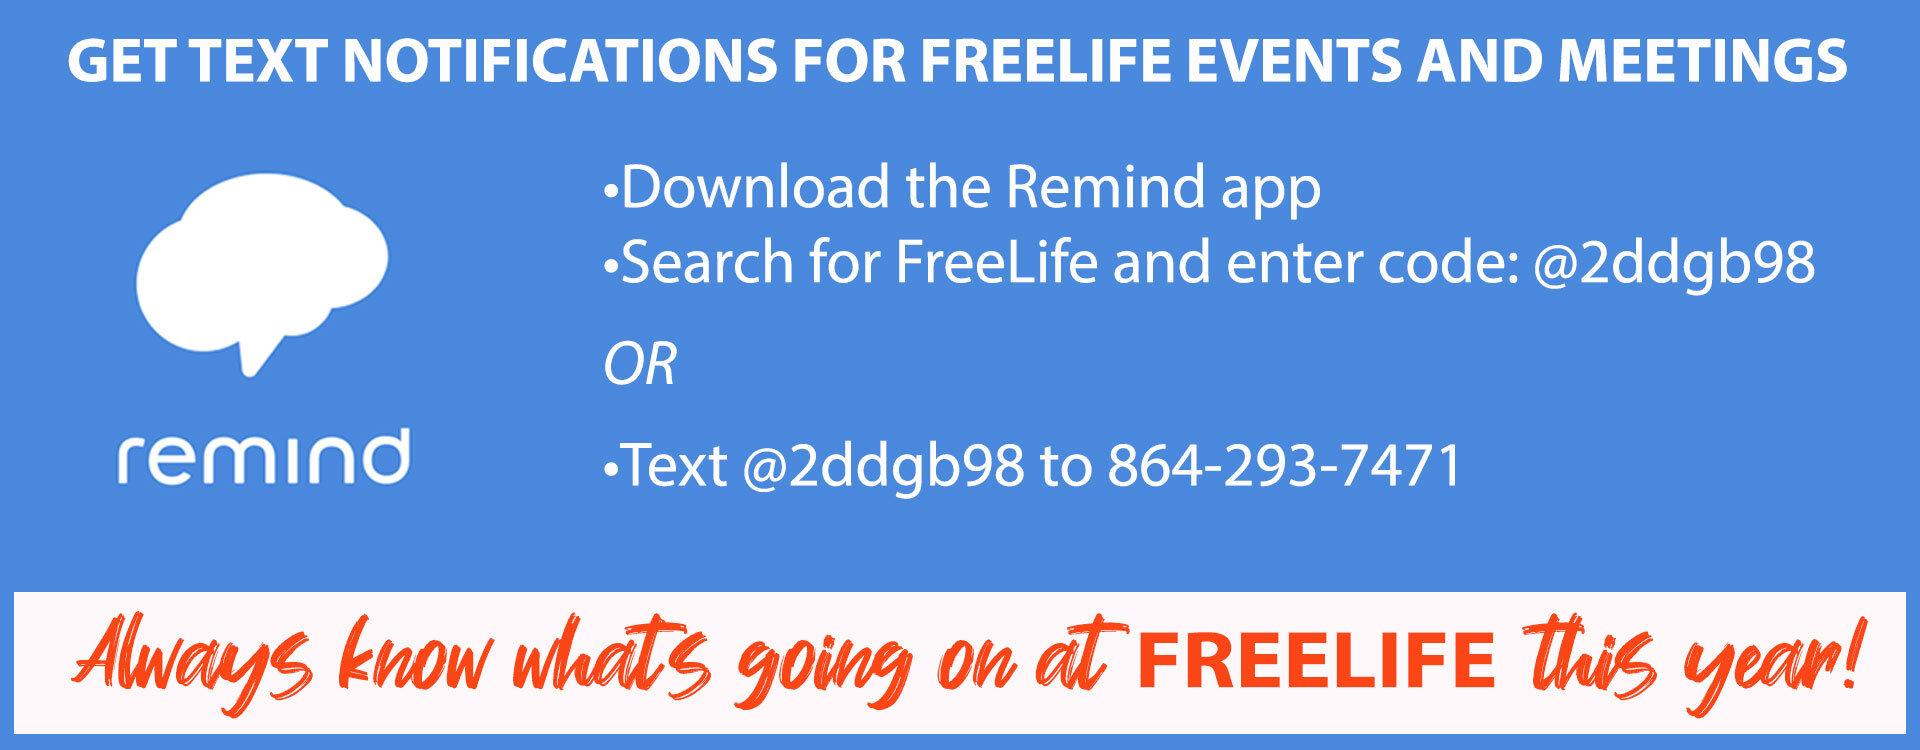 Remind-APp-Invitation (2).jpg